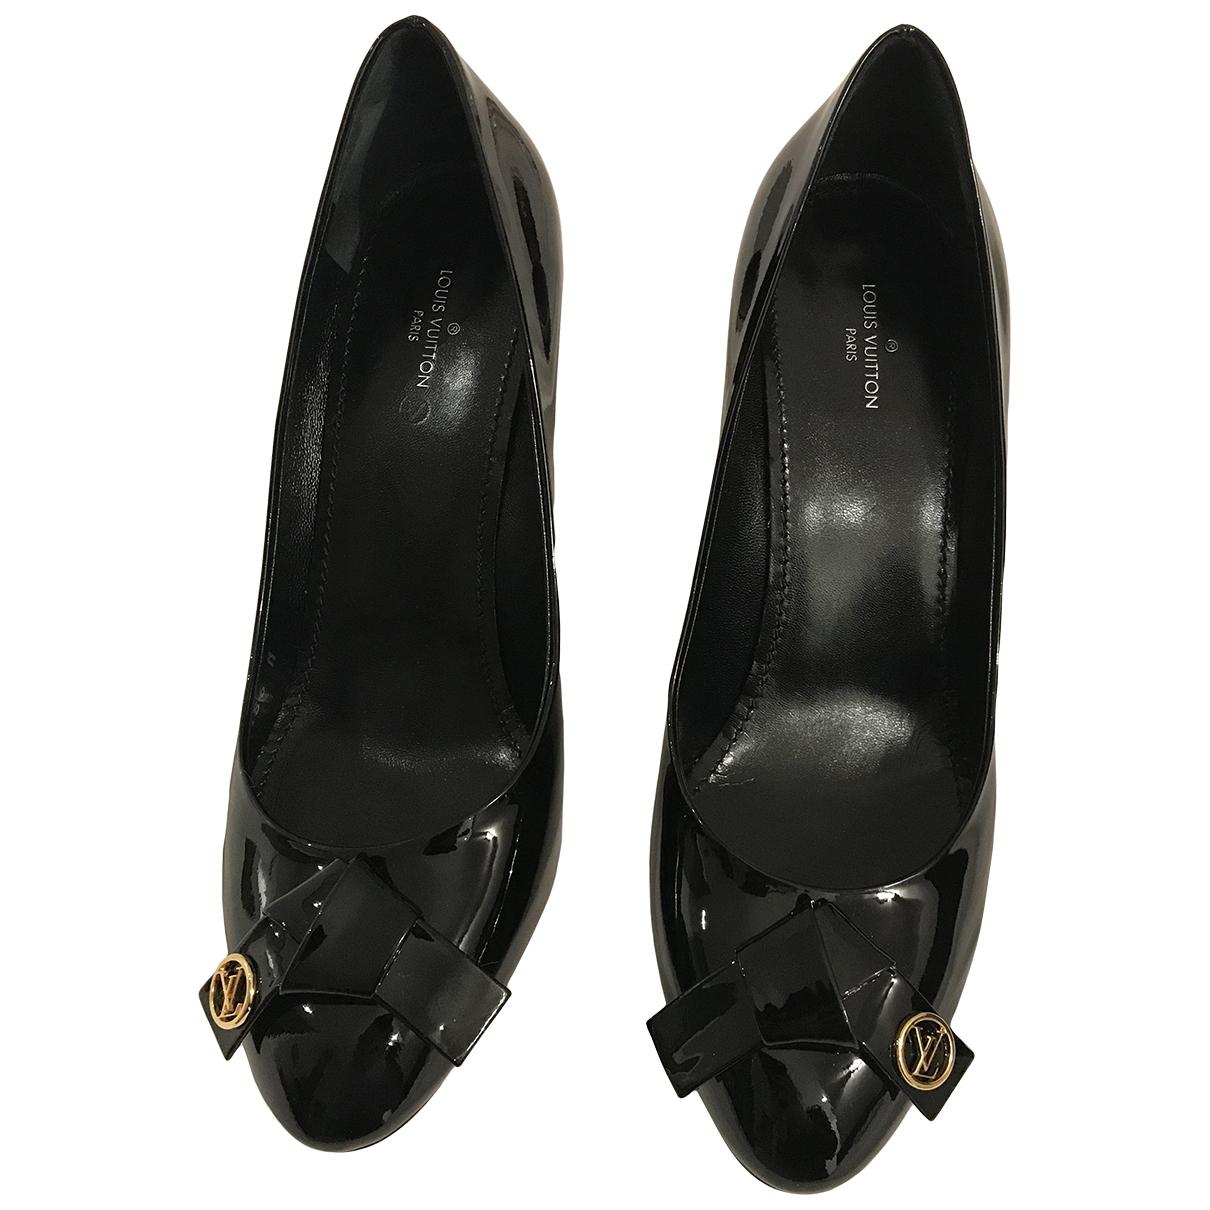 Louis Vuitton \N Black Patent leather Heels for Women 37 EU